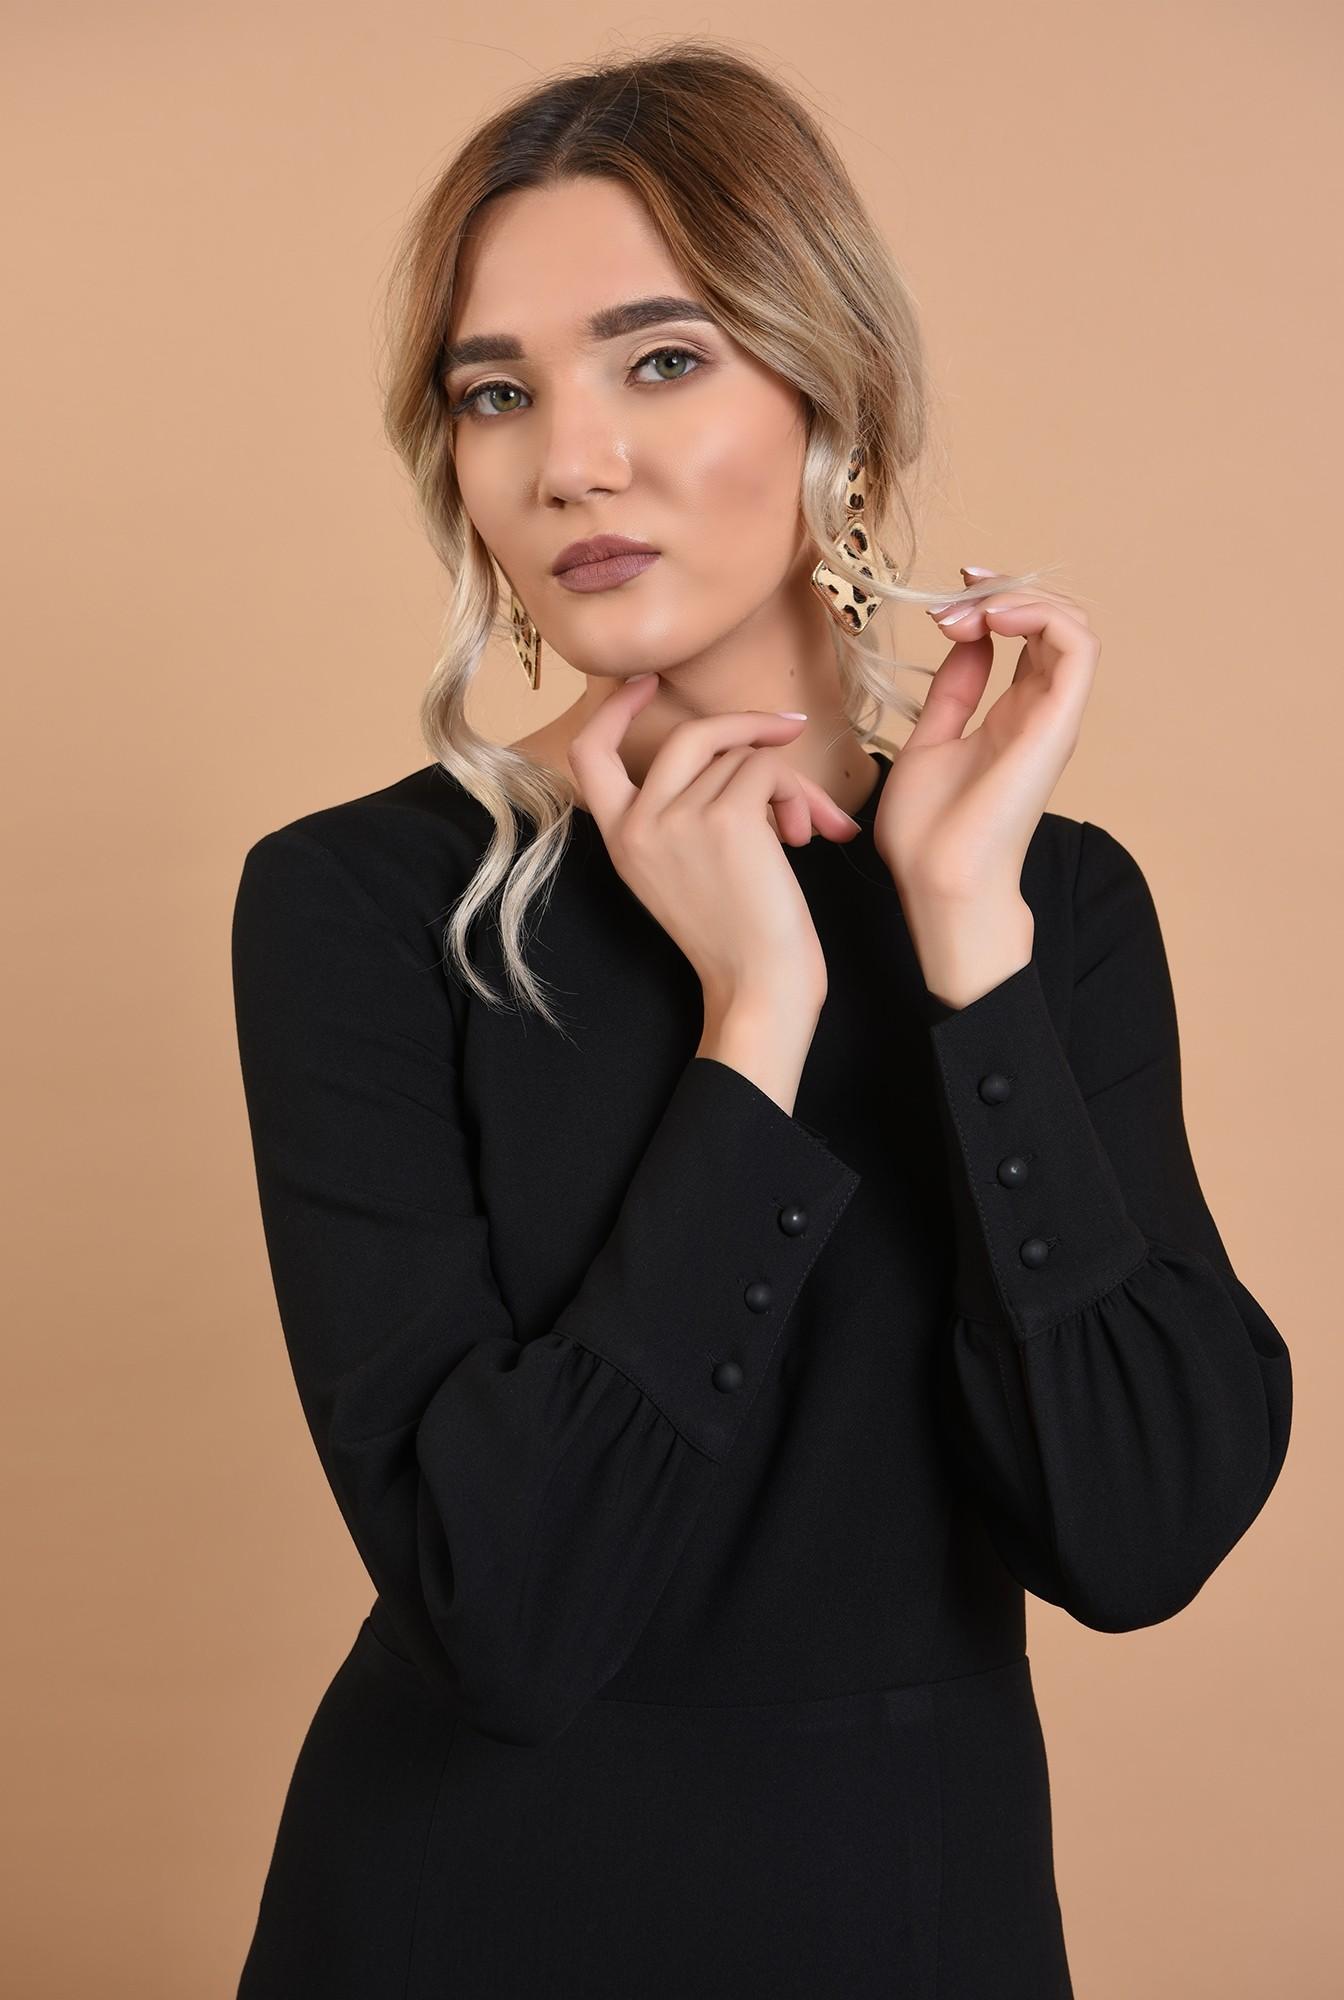 2 - rochie office, neagra, conica, lungime midi, mansete cu nasturi perla